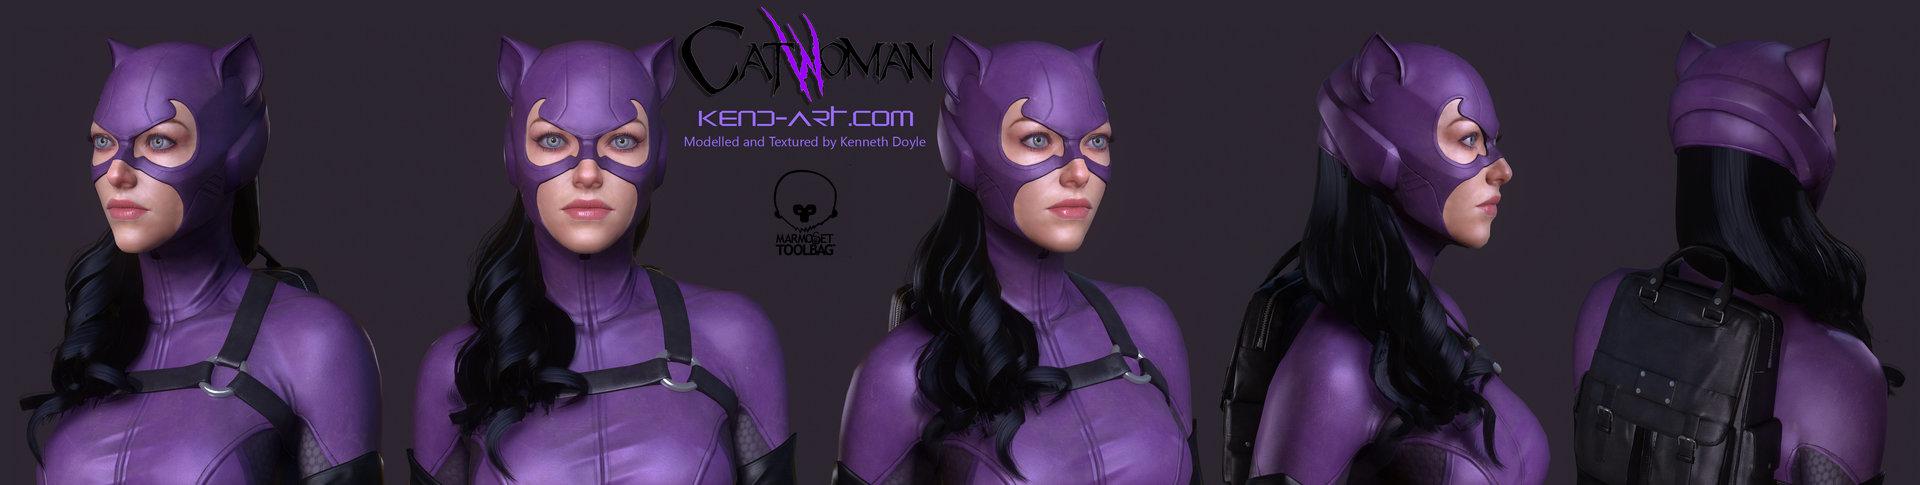 Kenneth doyle catwoman2